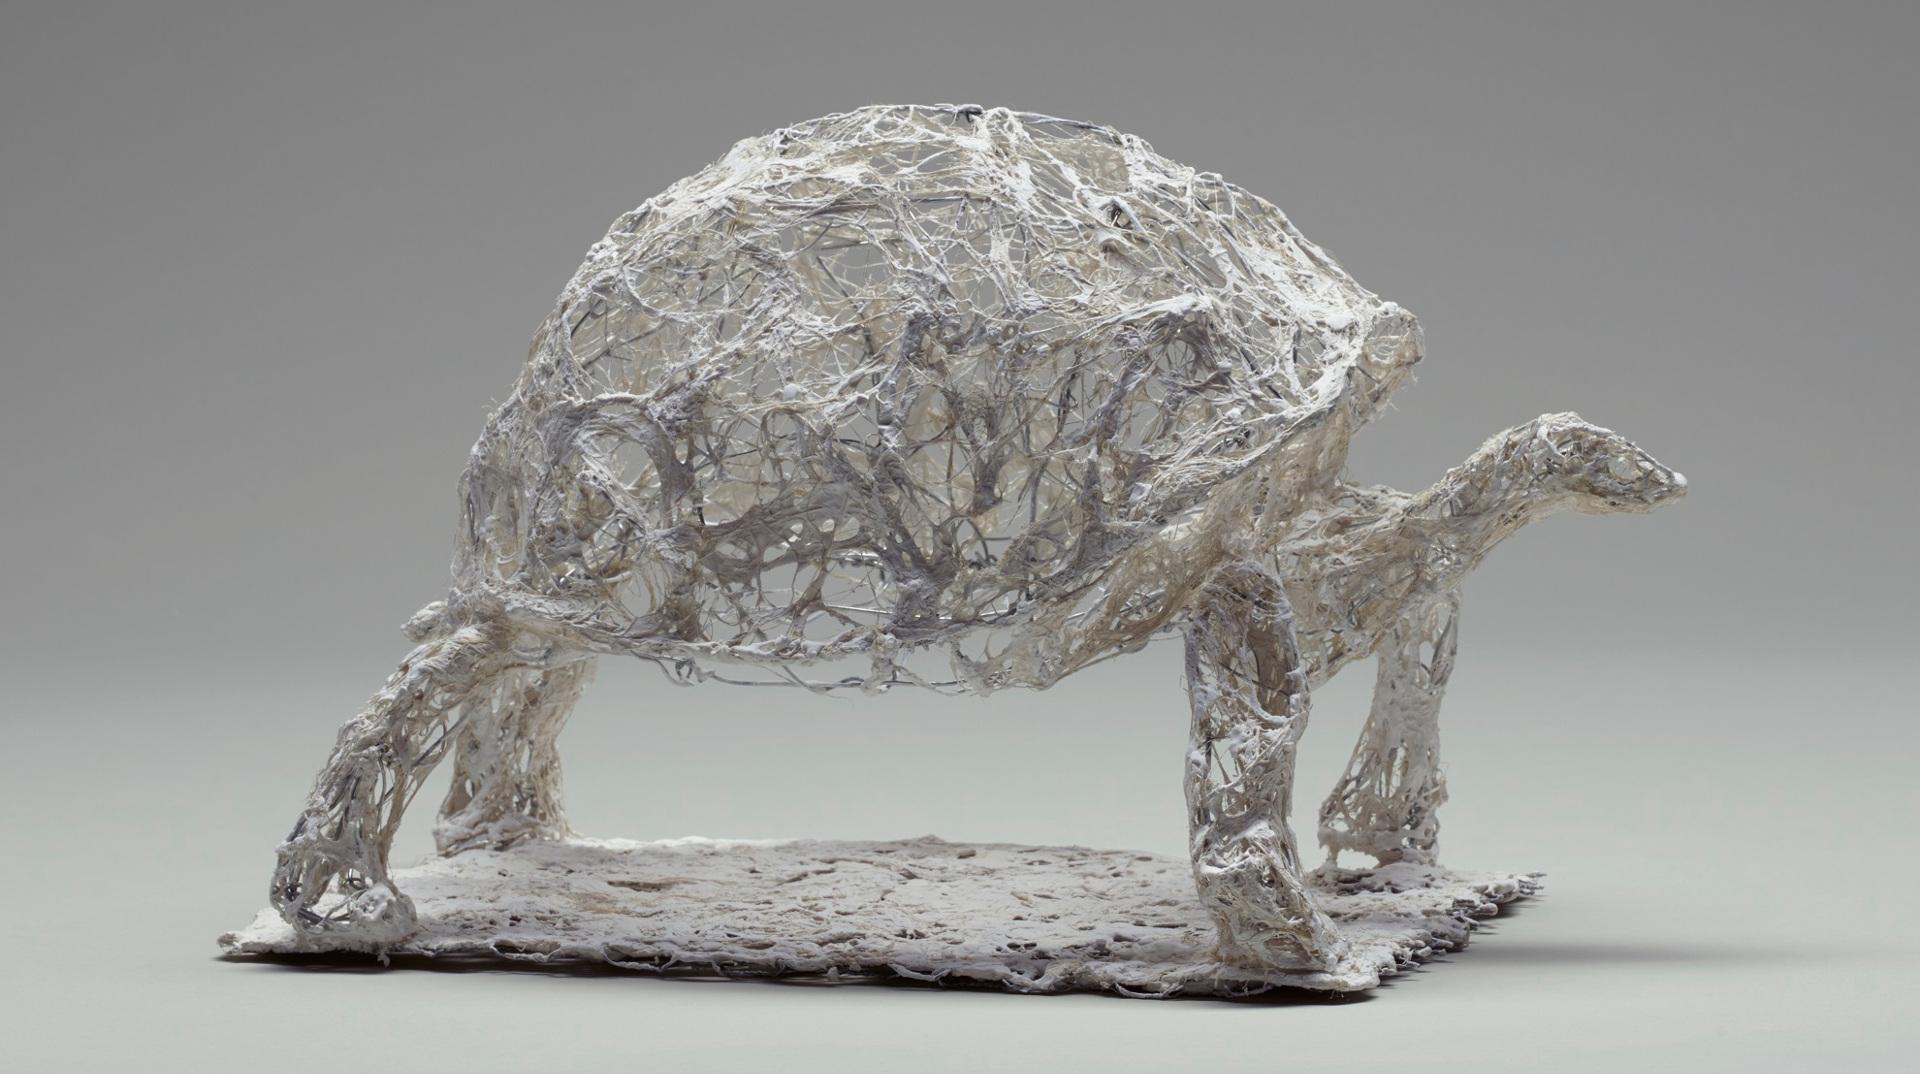 Tortue, 31x20x23cm, fil de fer, plâtre, filasse, 2015. Nathalie Garidou